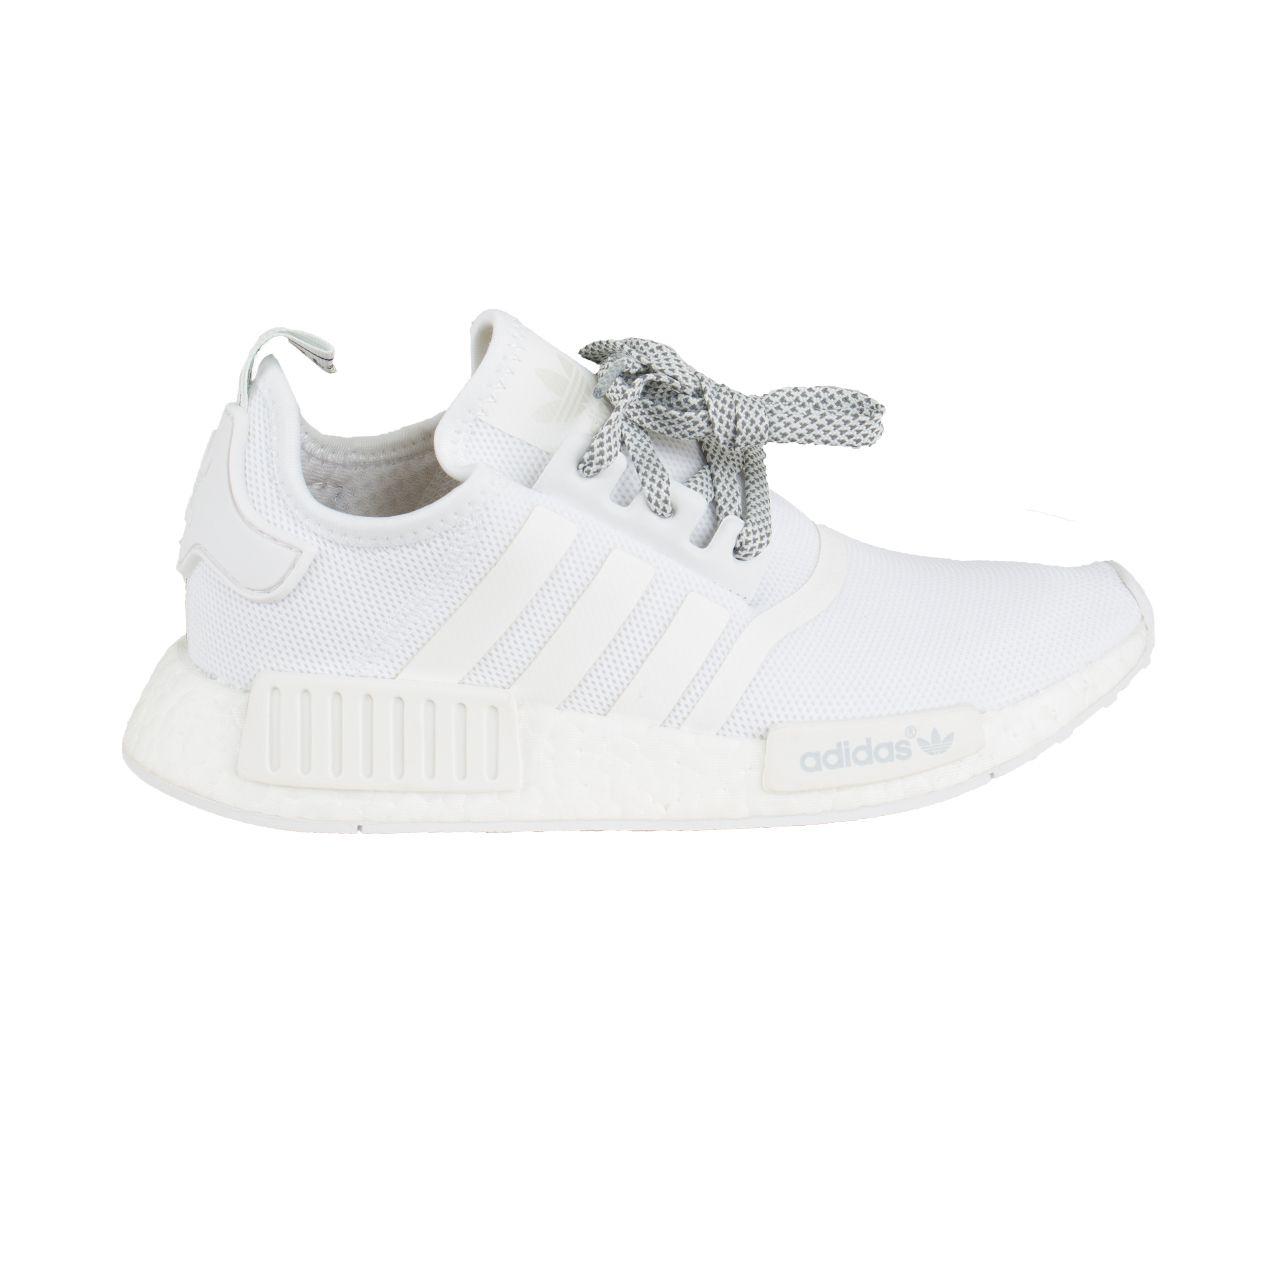 Nmd_r1 Adidas - Chaussures De Sport Pour Les Hommes - Blanc 9YWa9cT